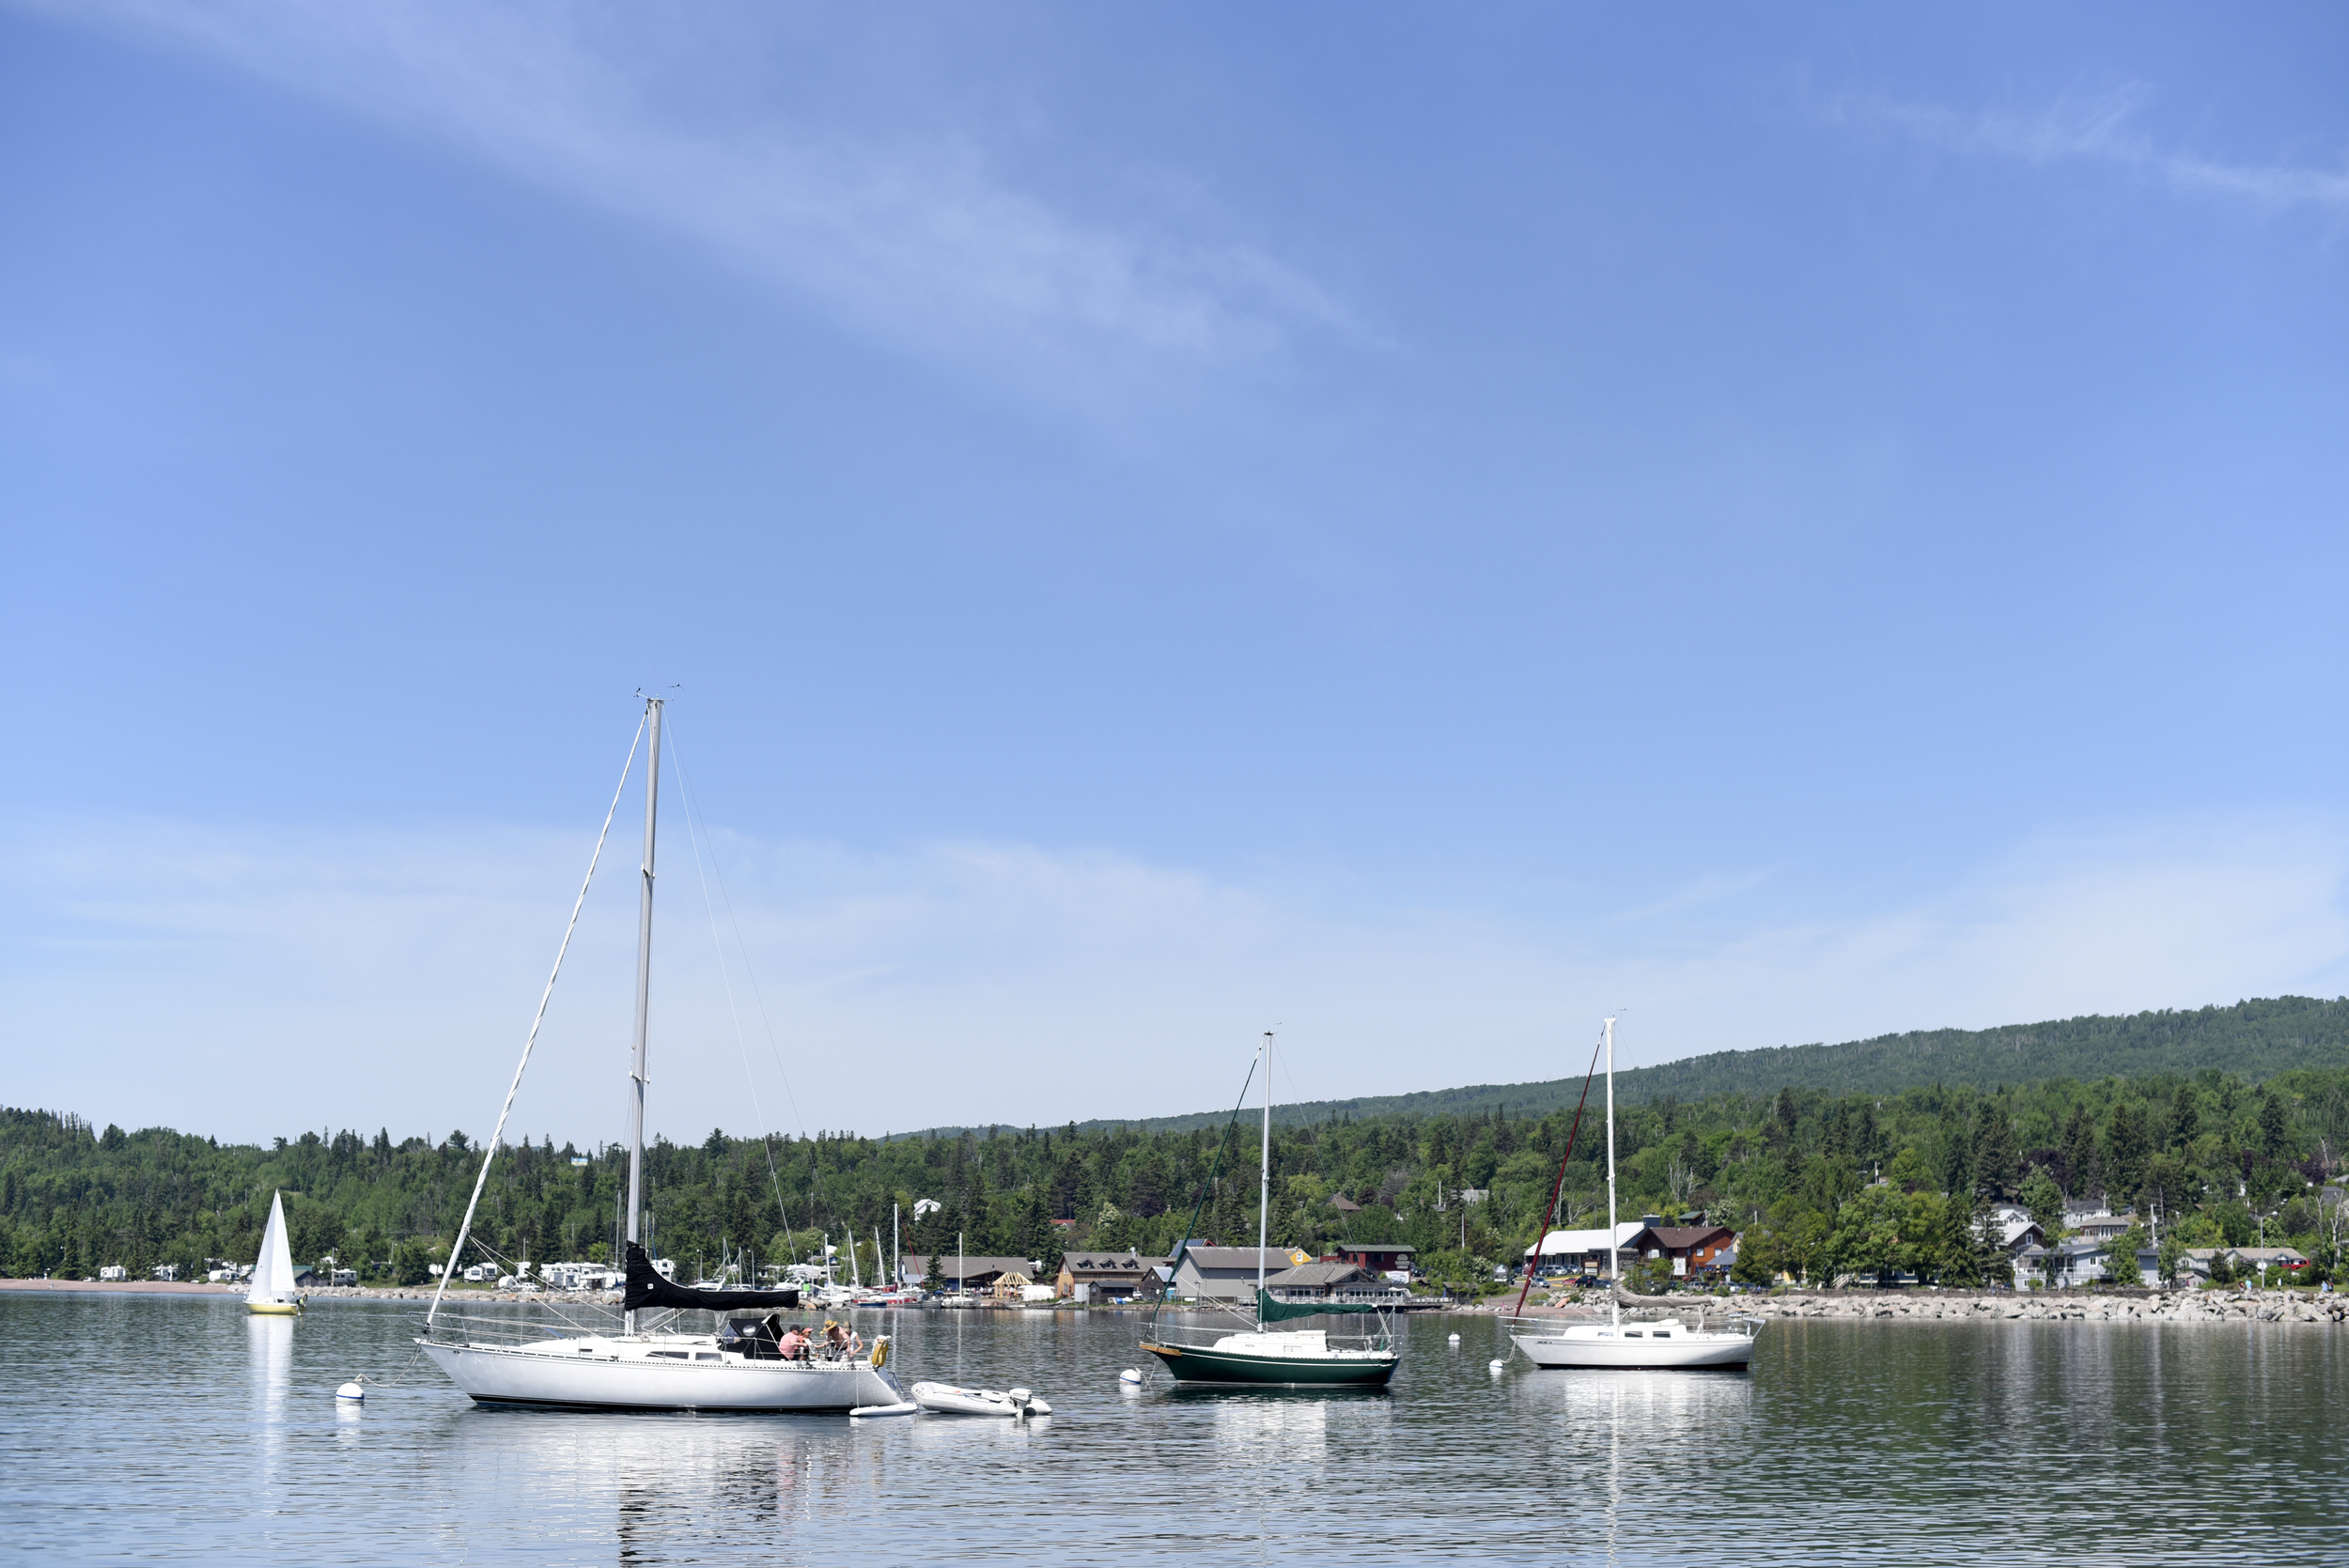 Boats in the harbor on Lake Superior in Grand Marais, Minn.